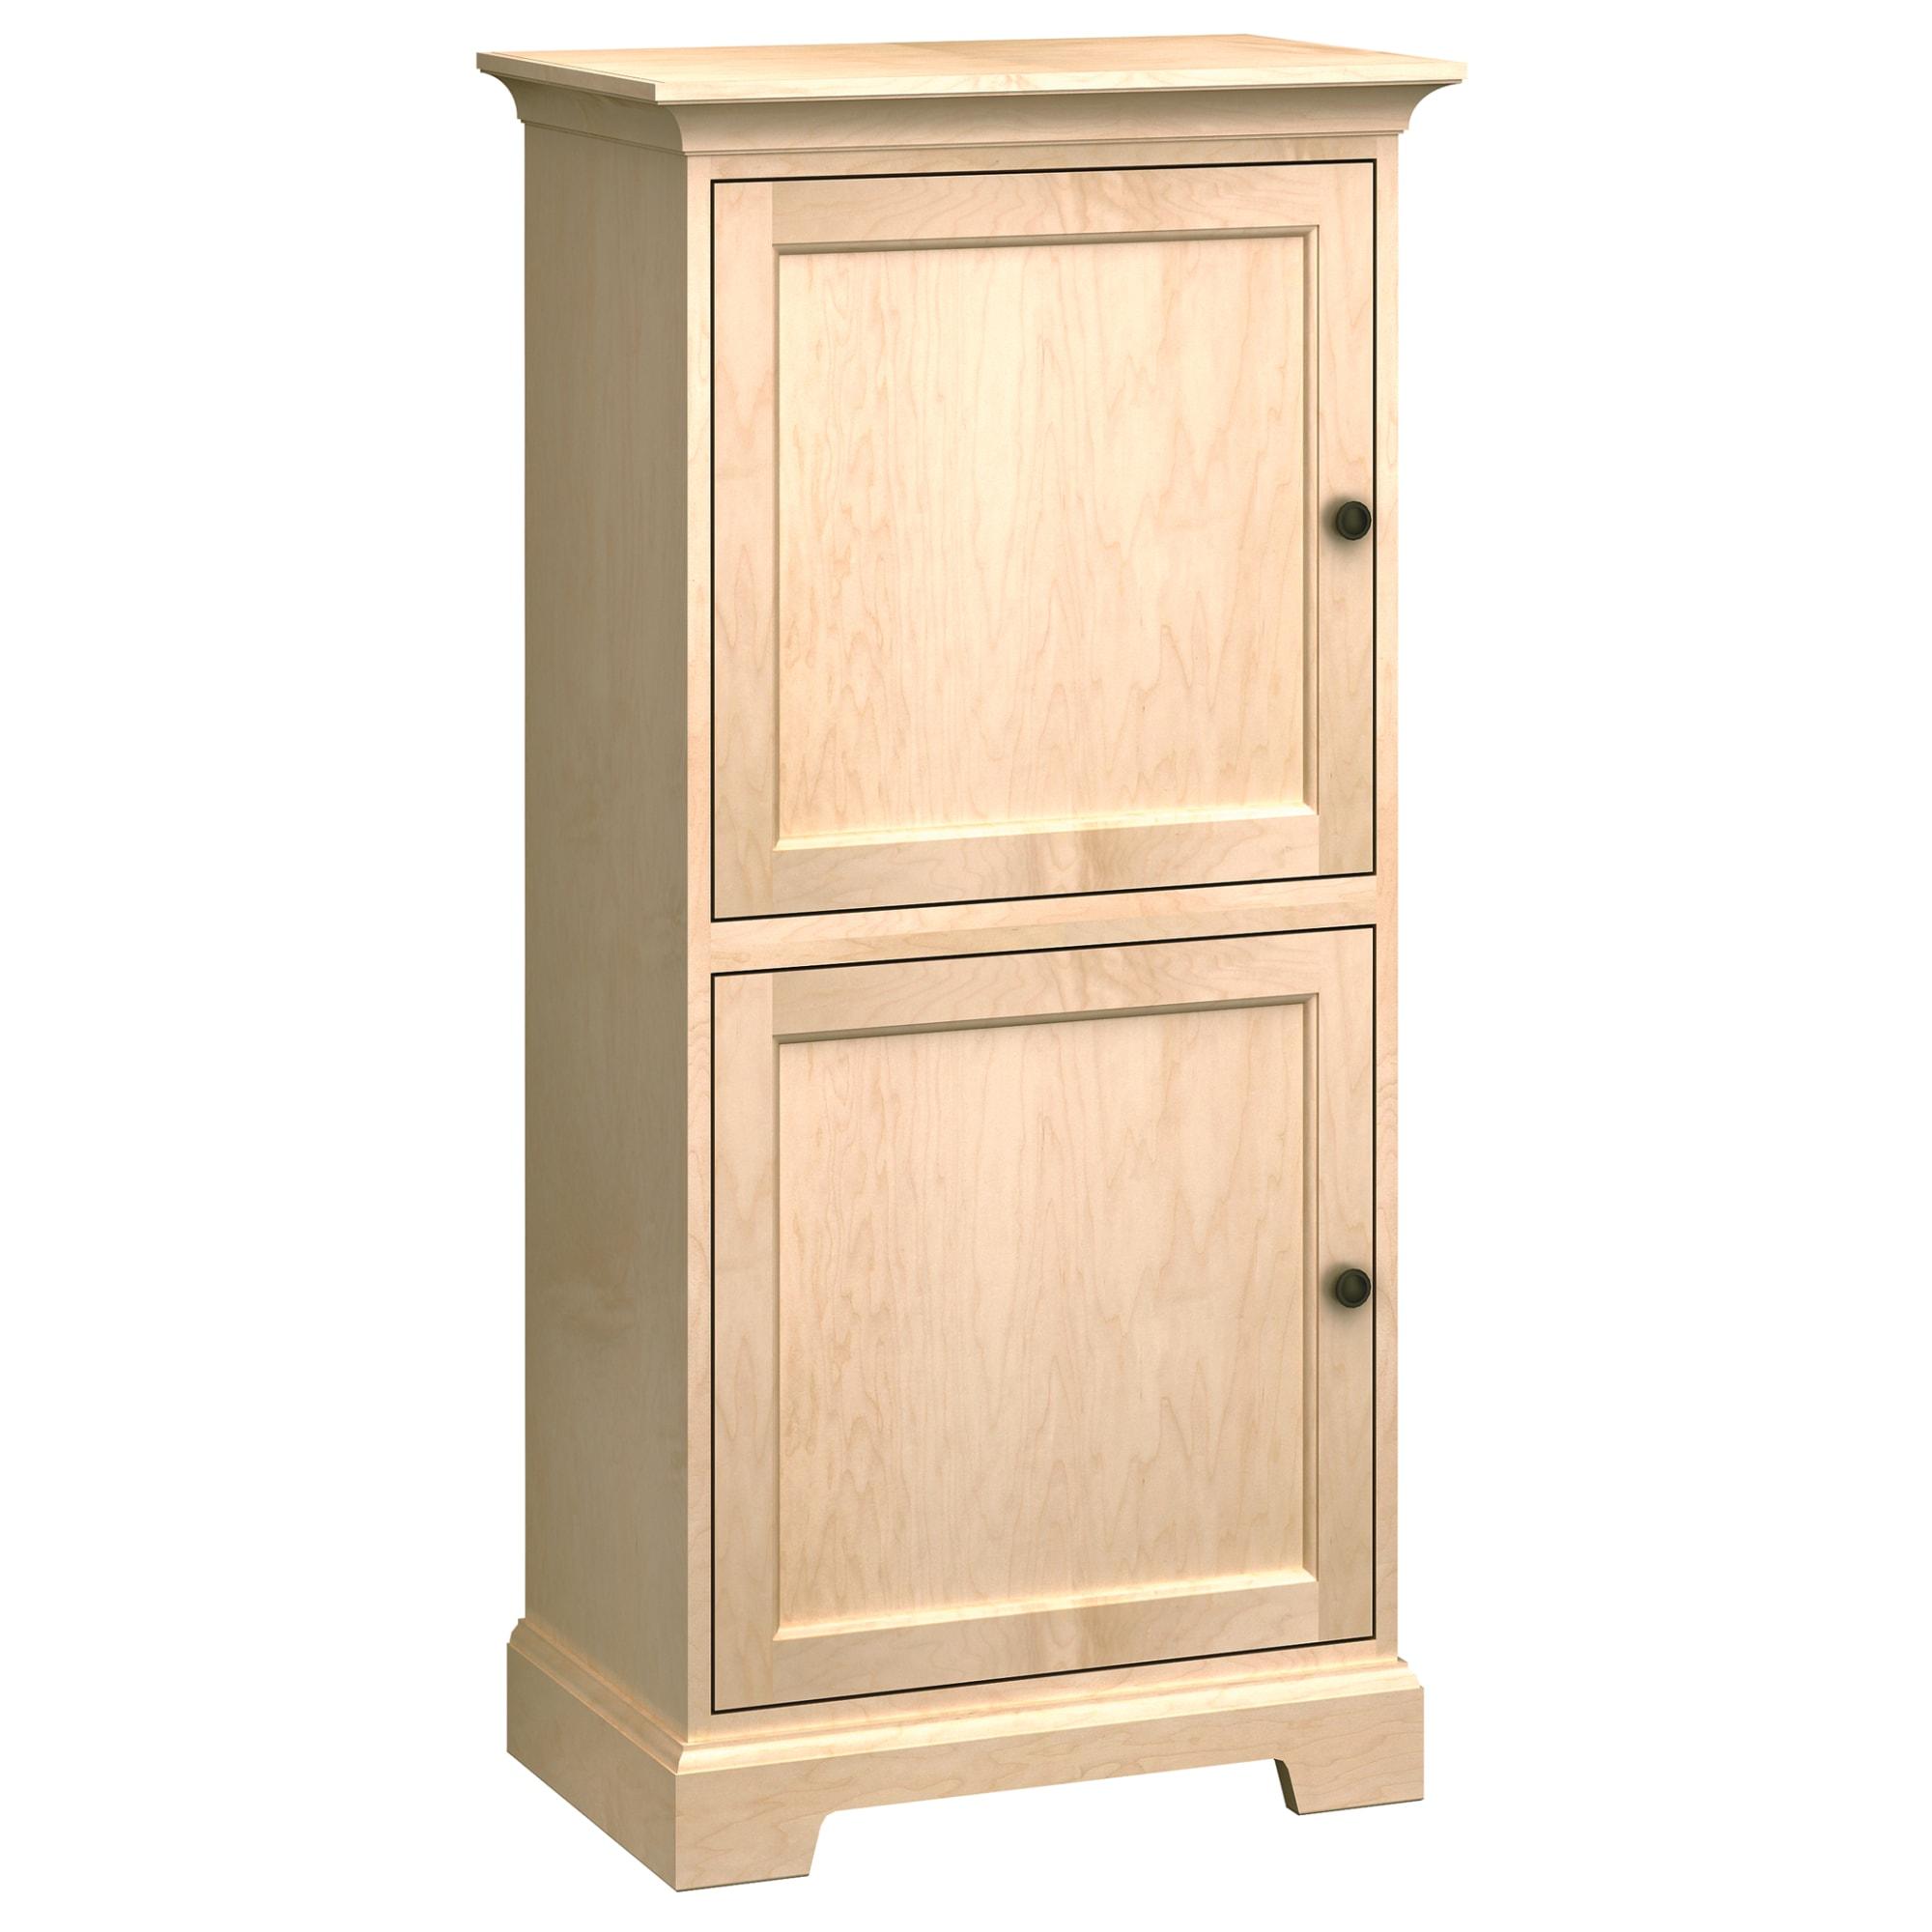 Image for HS27G Custom Home Storage Cabinet from Howard Miller Official Website